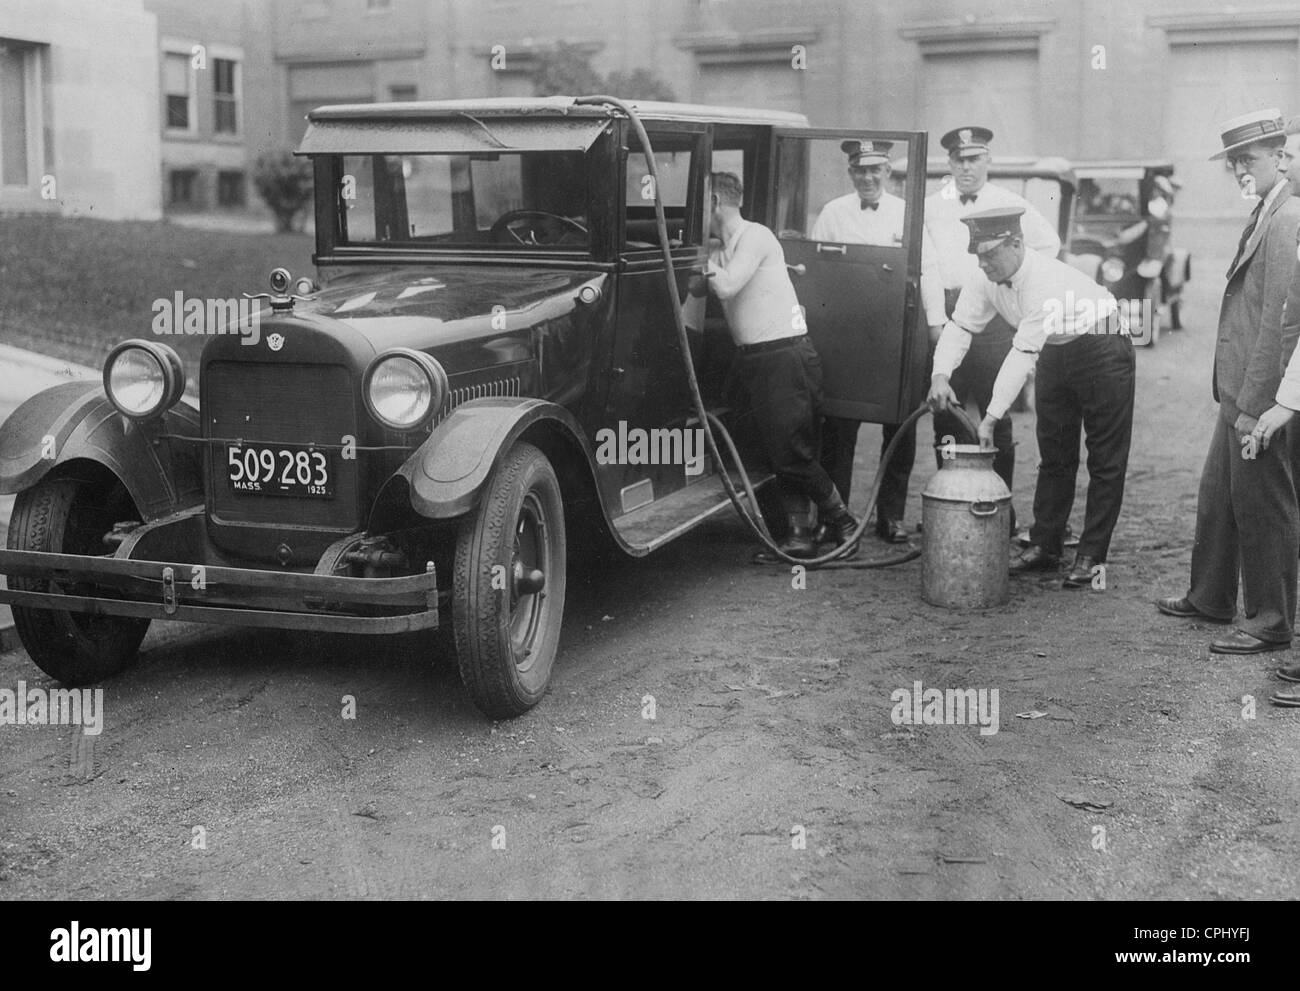 Alkoholschmuggel während der Prohibition in den USA Stockbild